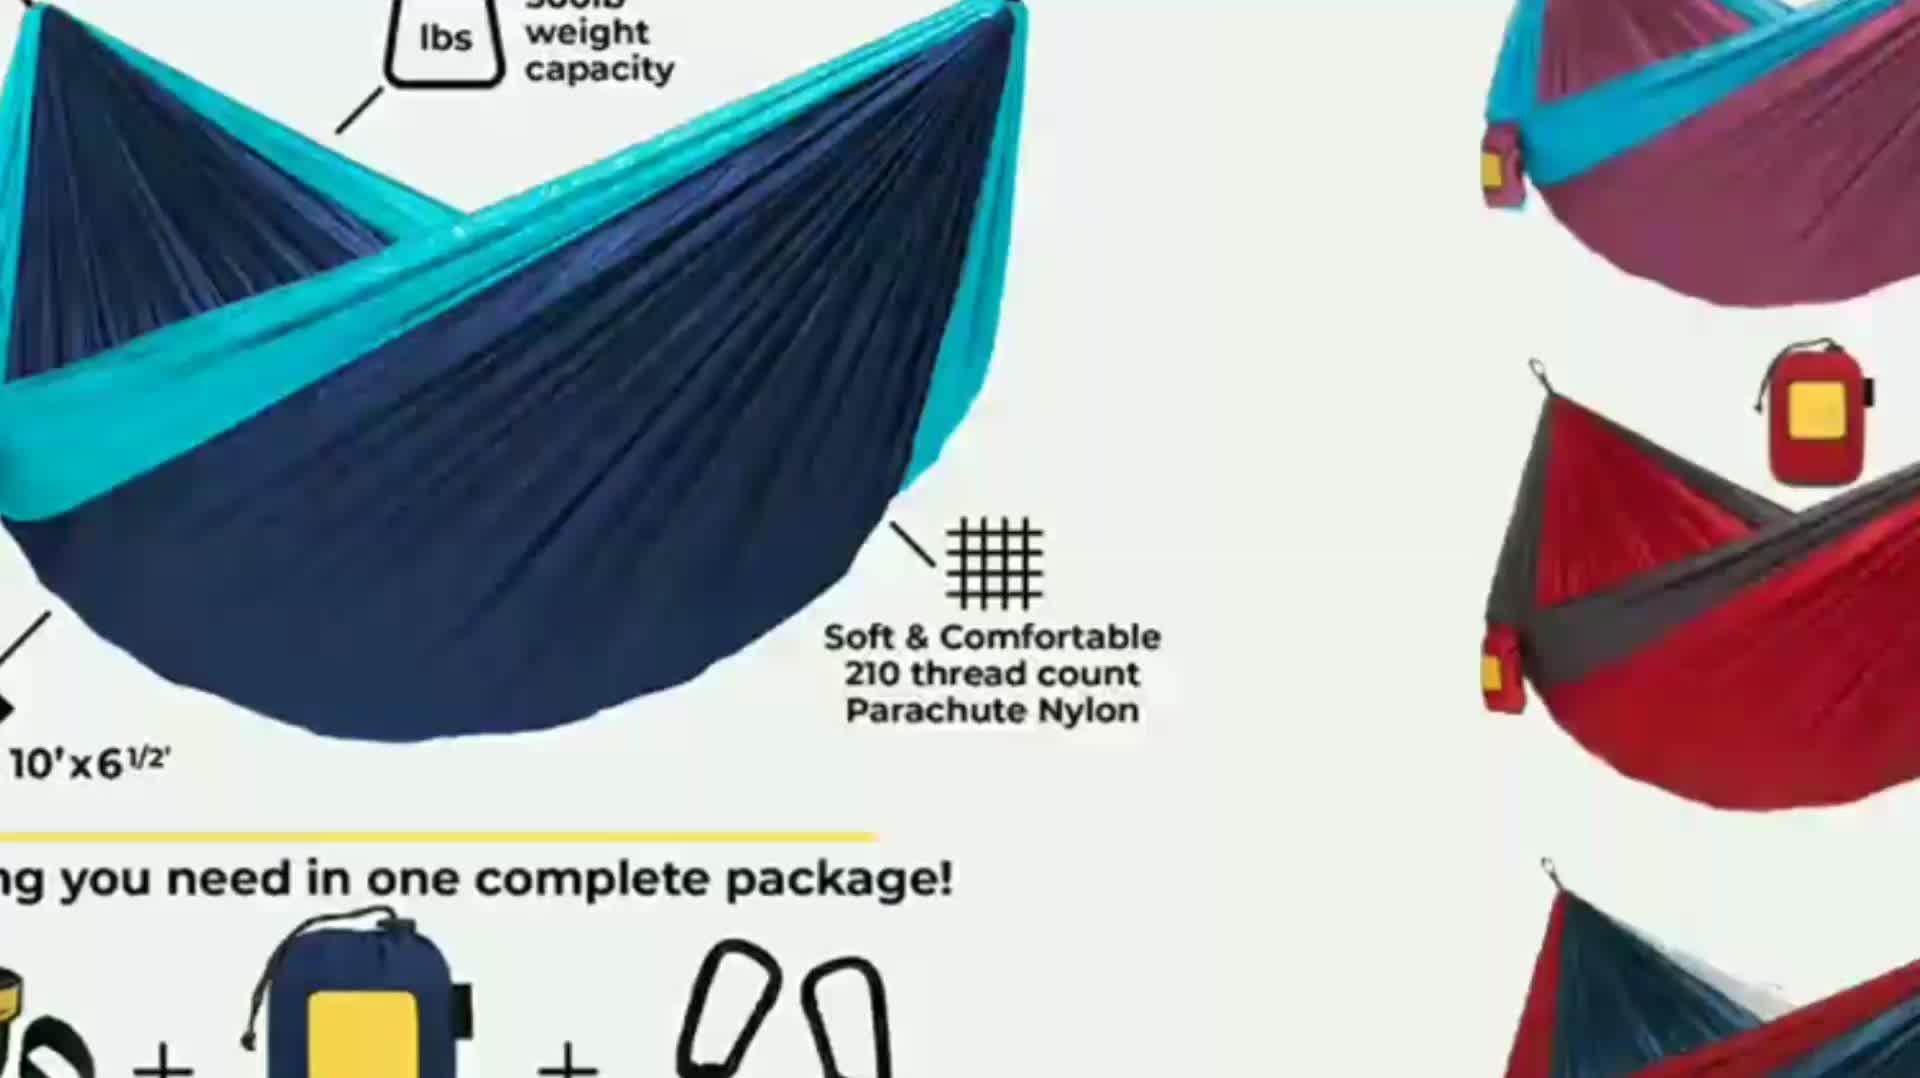 Outdoor Leisure Double 2 Person Cotton Hammocks 450lbs Ultralight Camping Hammock